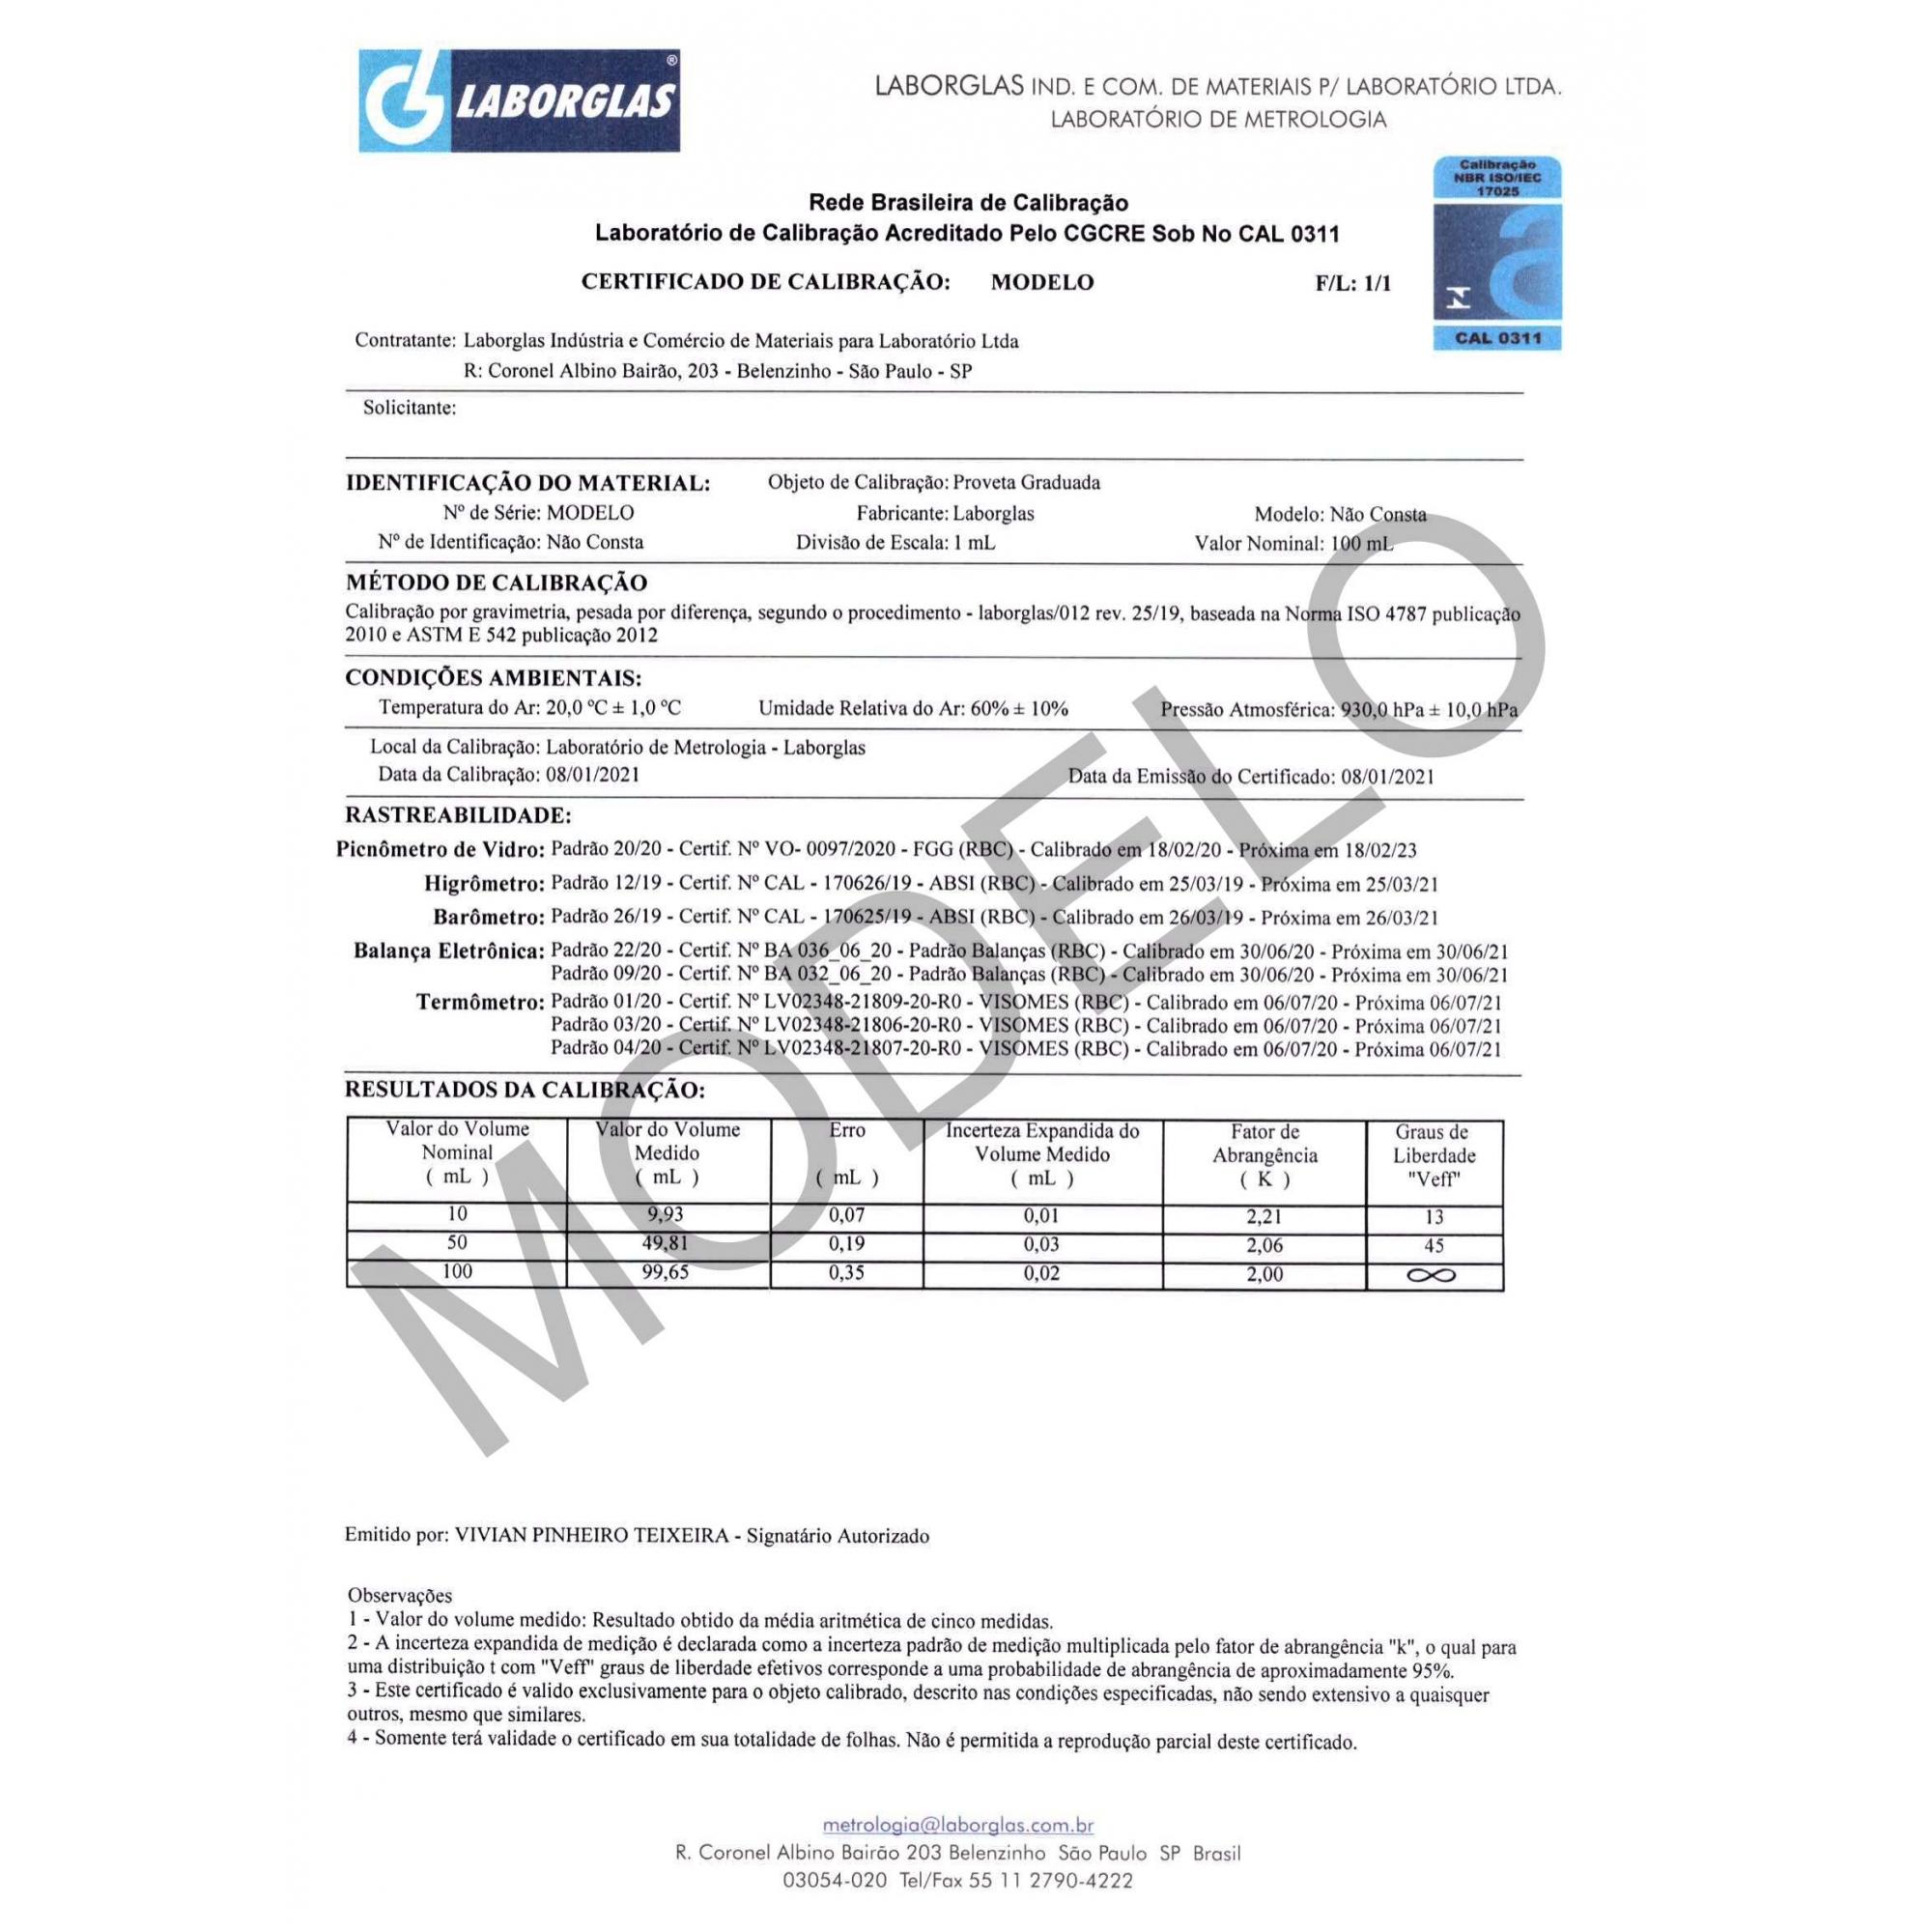 PROVETA GRADUADA BASE HEXAGONAL DE VIDRO 500 ML CLASSE A CERTIFICADO RBC - Laborglas - Cód. 9139744-R